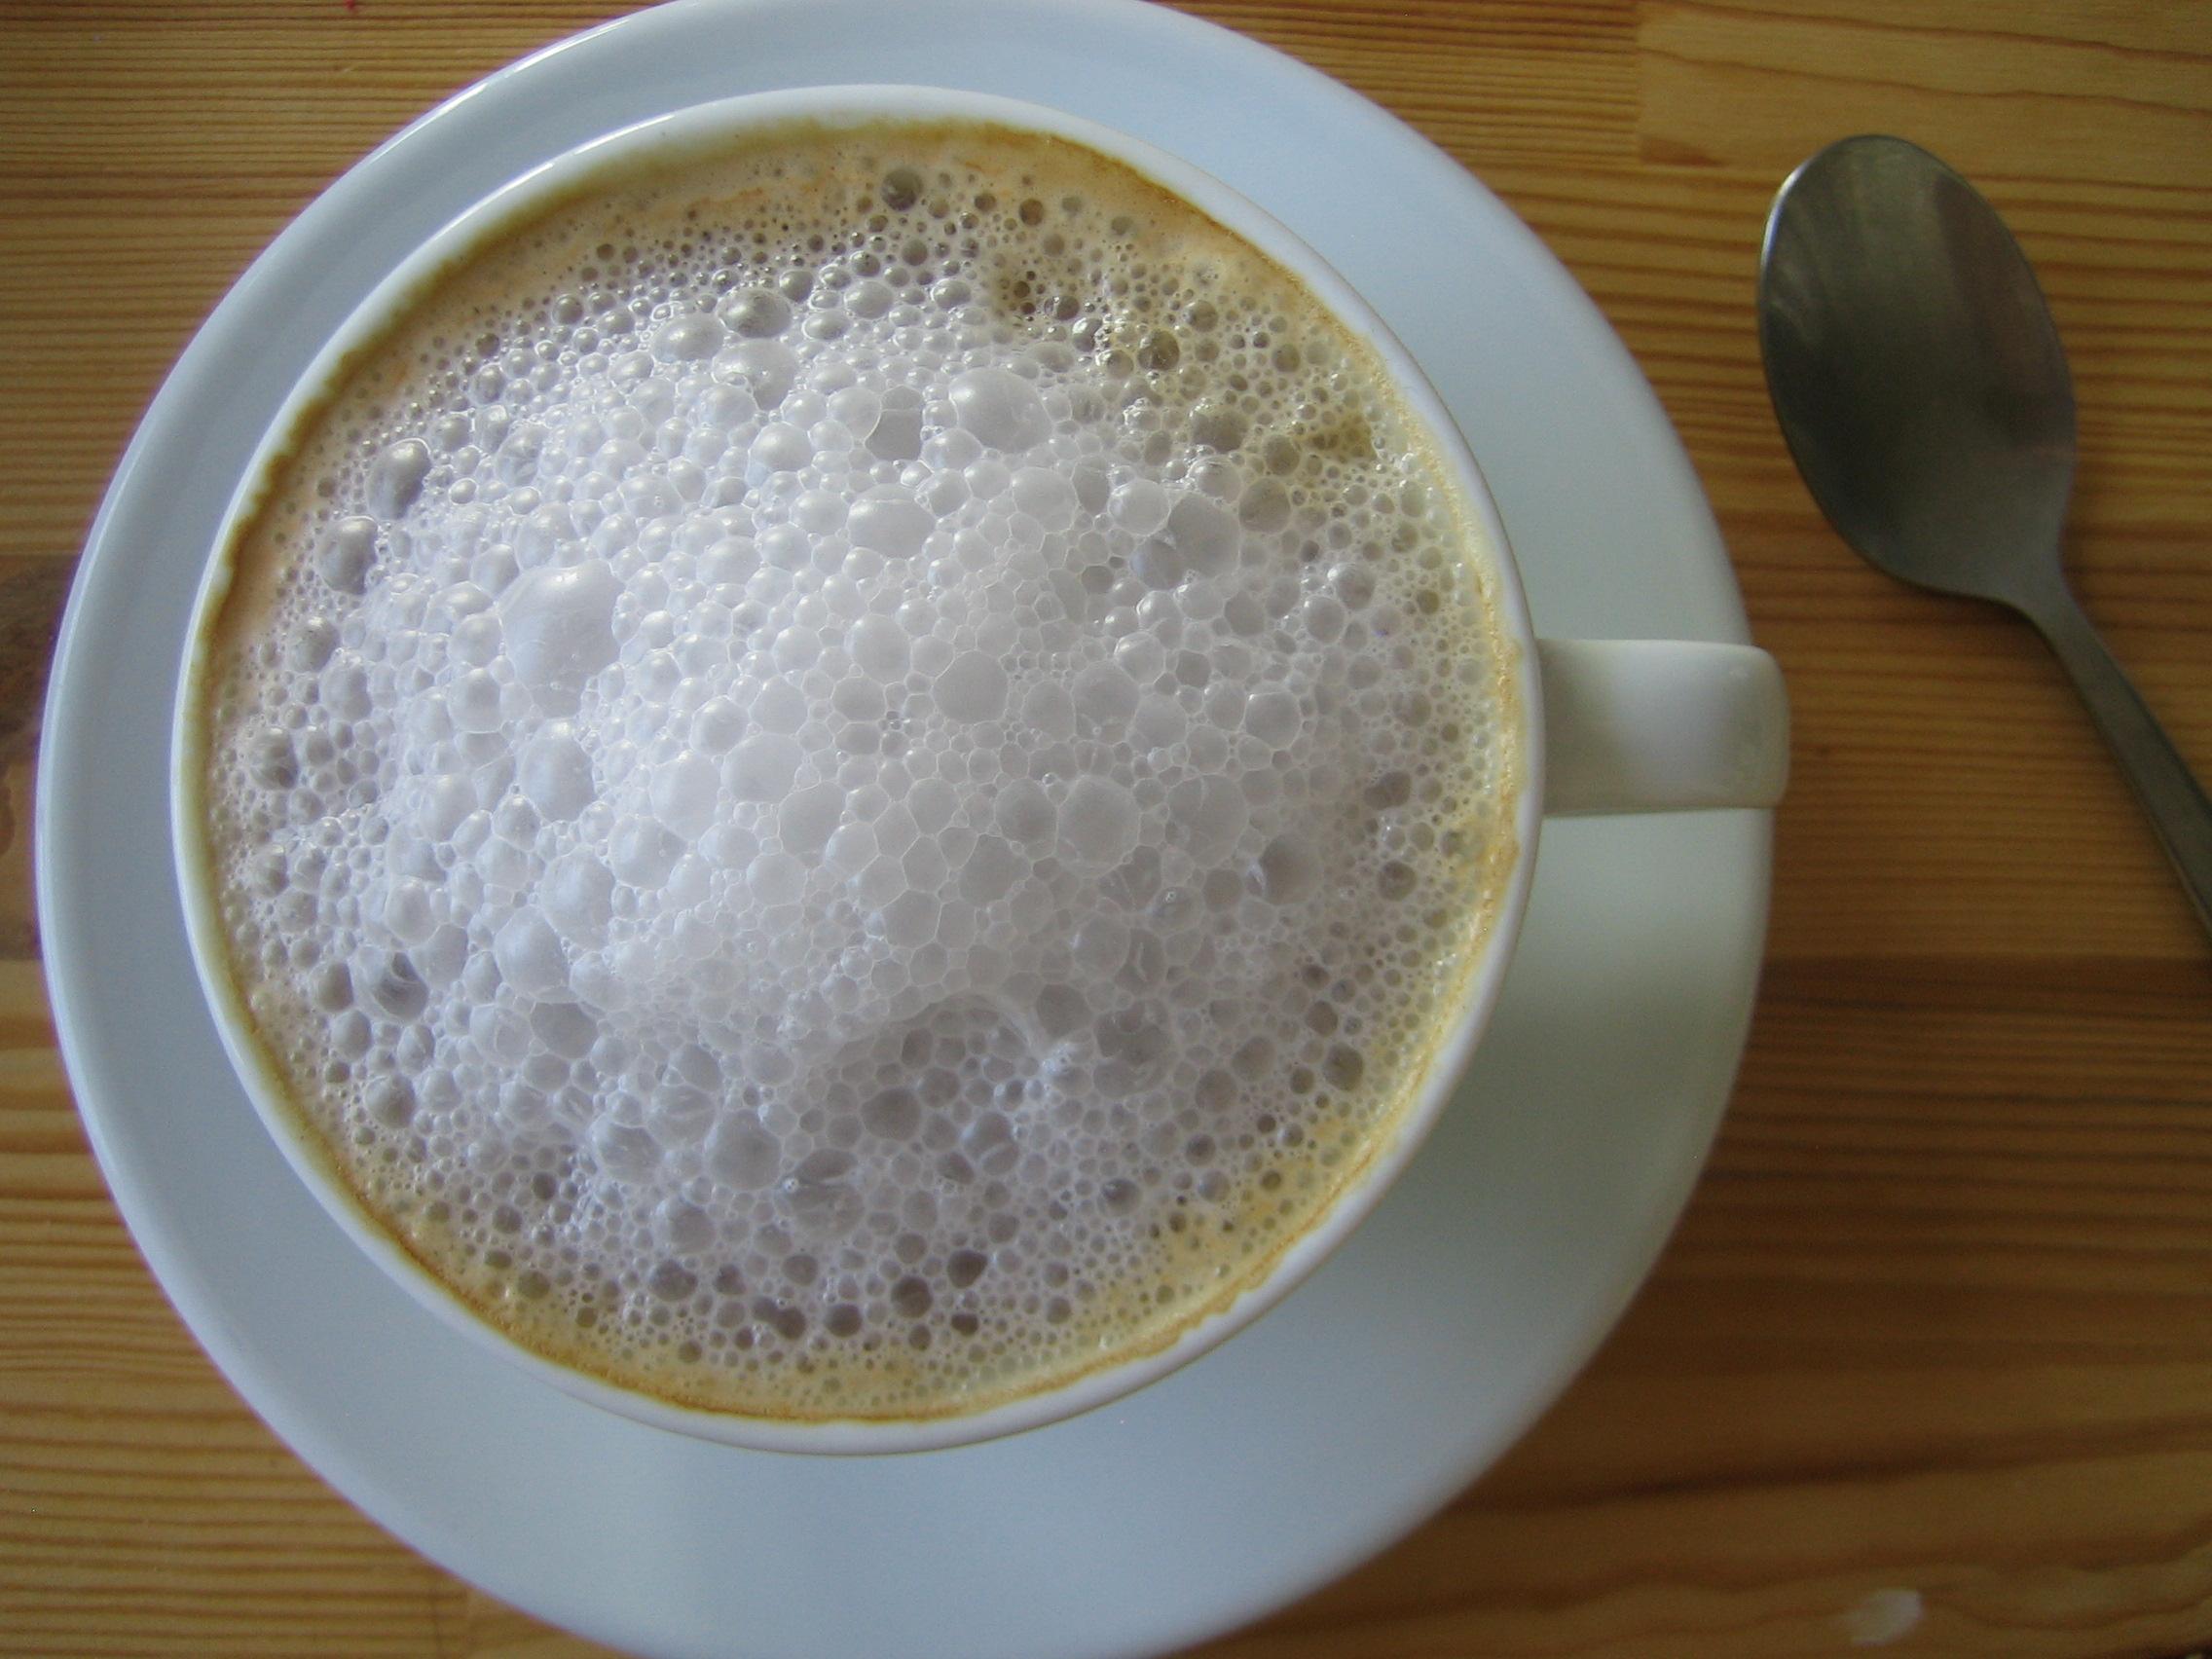 Milk foam